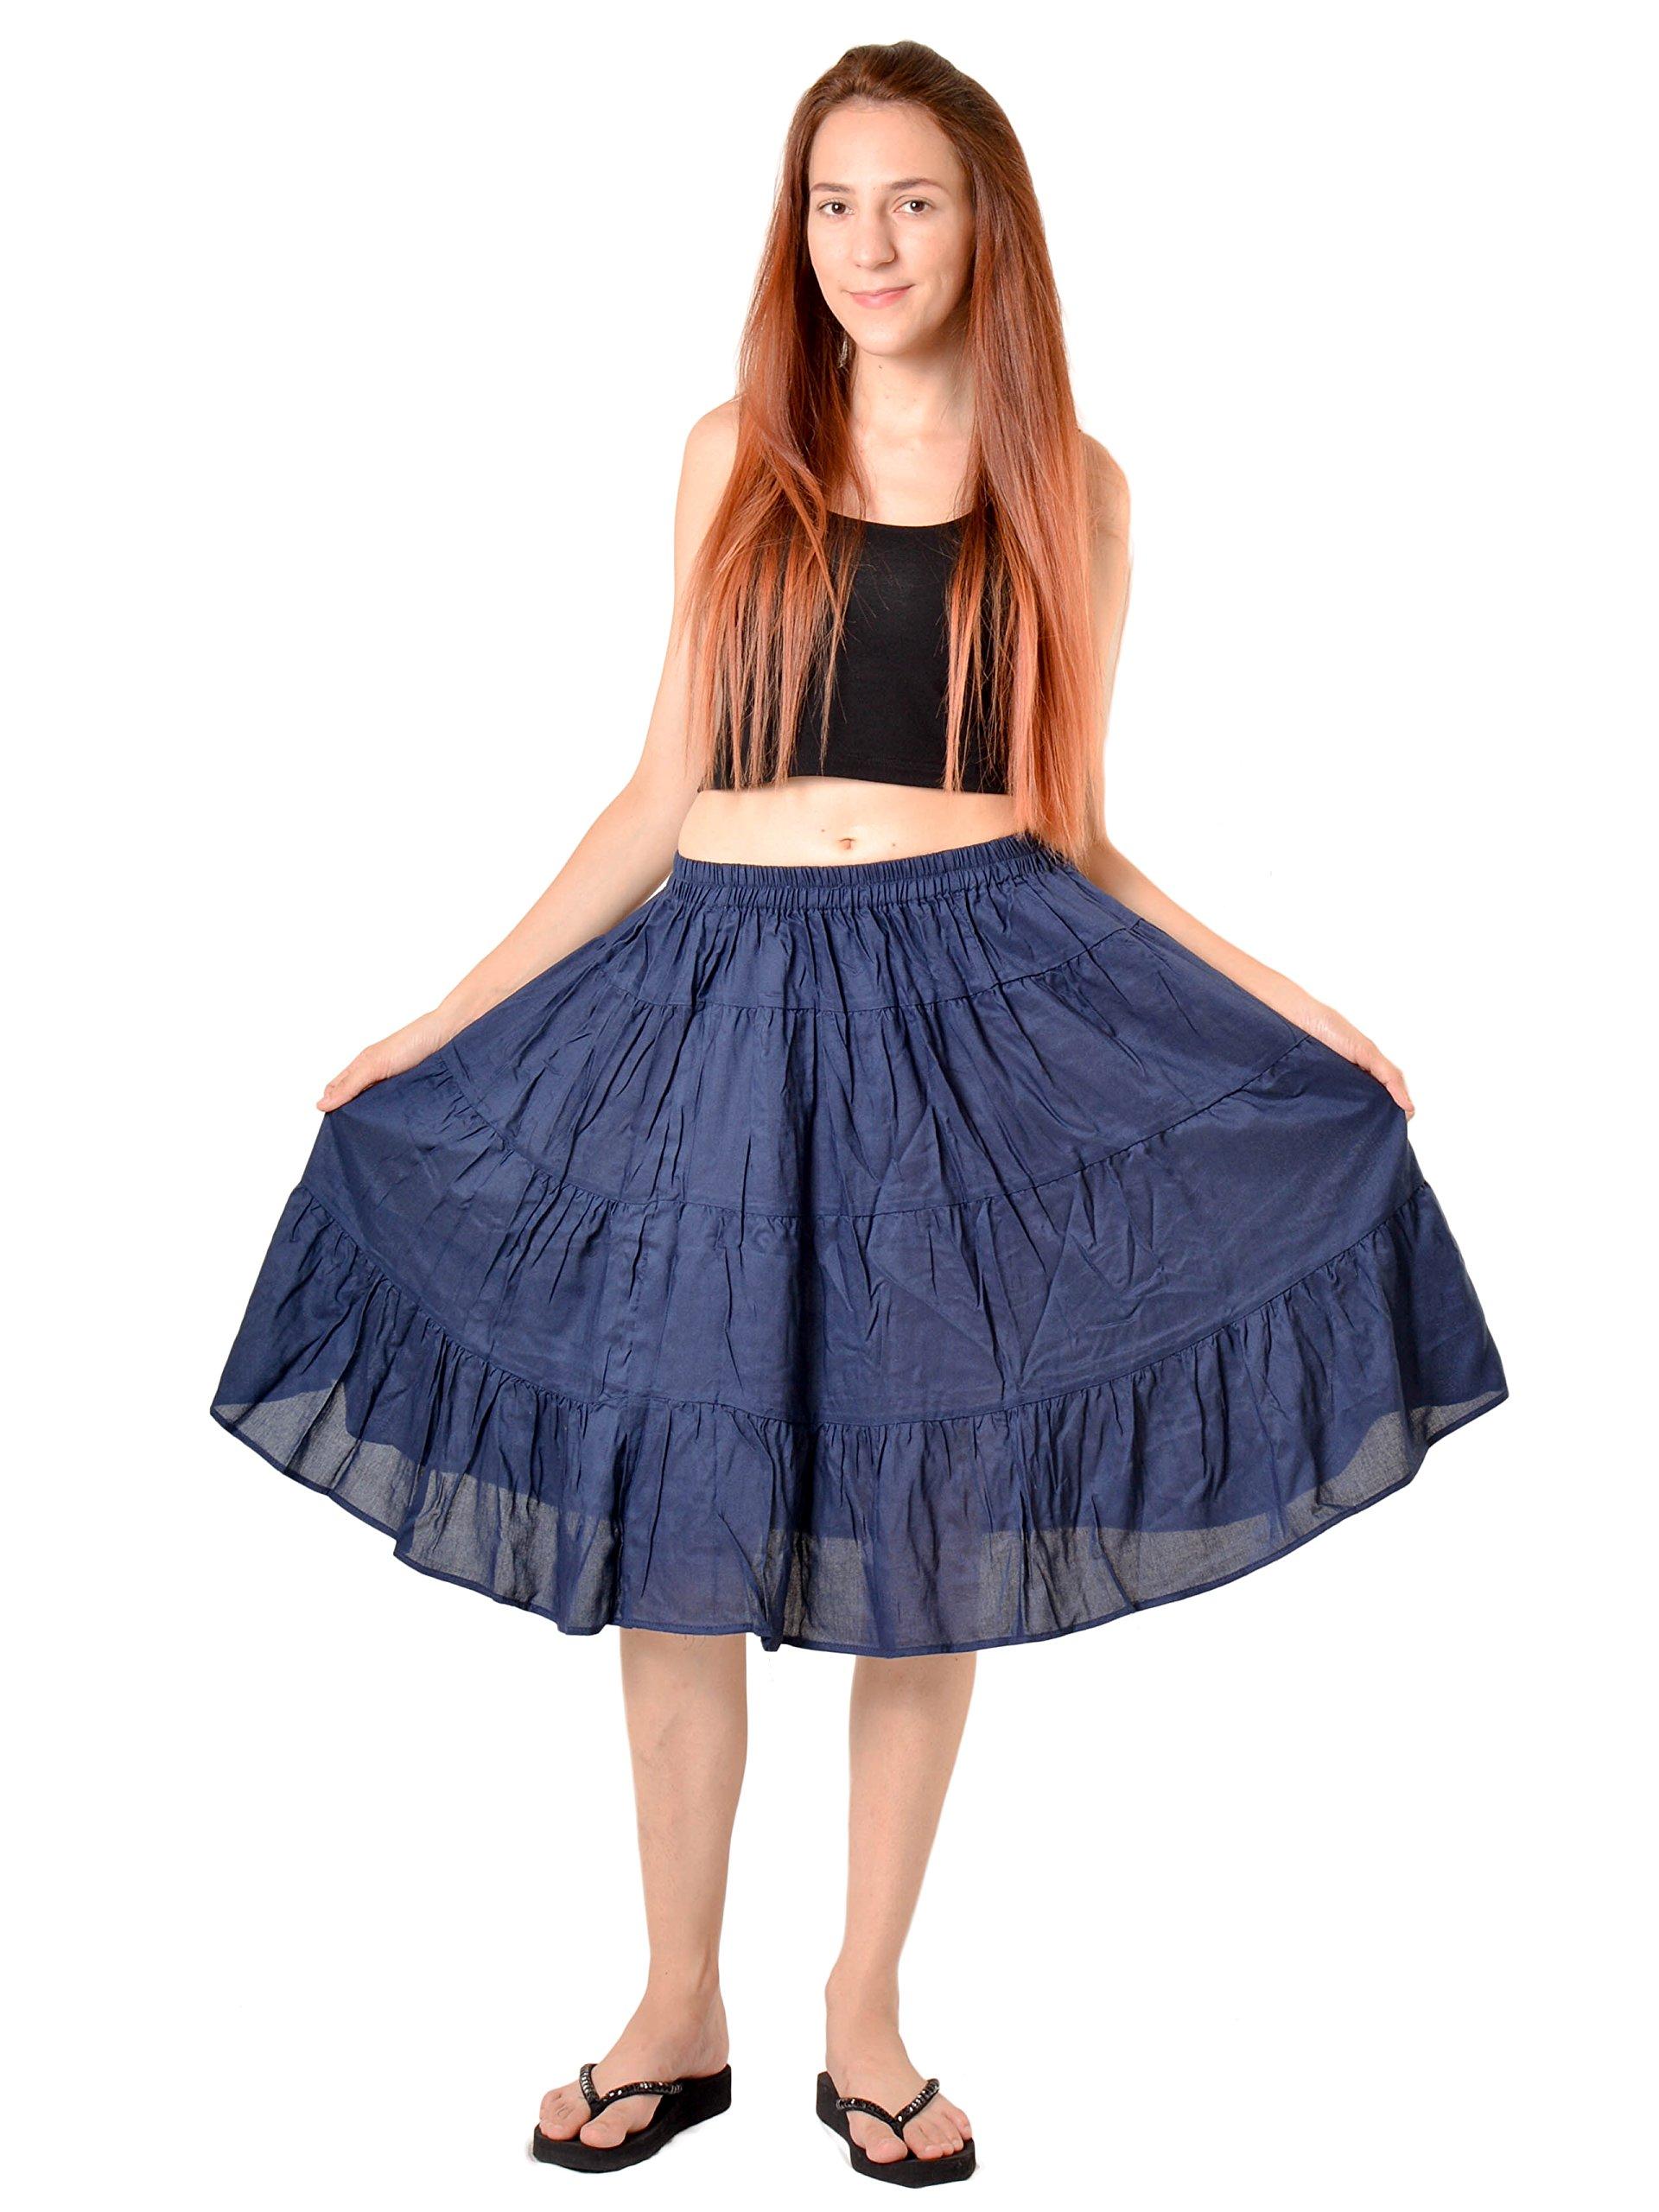 Orient Trail Women's Hippie Bohemian Boho Knee Length Skirt Medium Dark Blue by Orient Trail (Image #2)